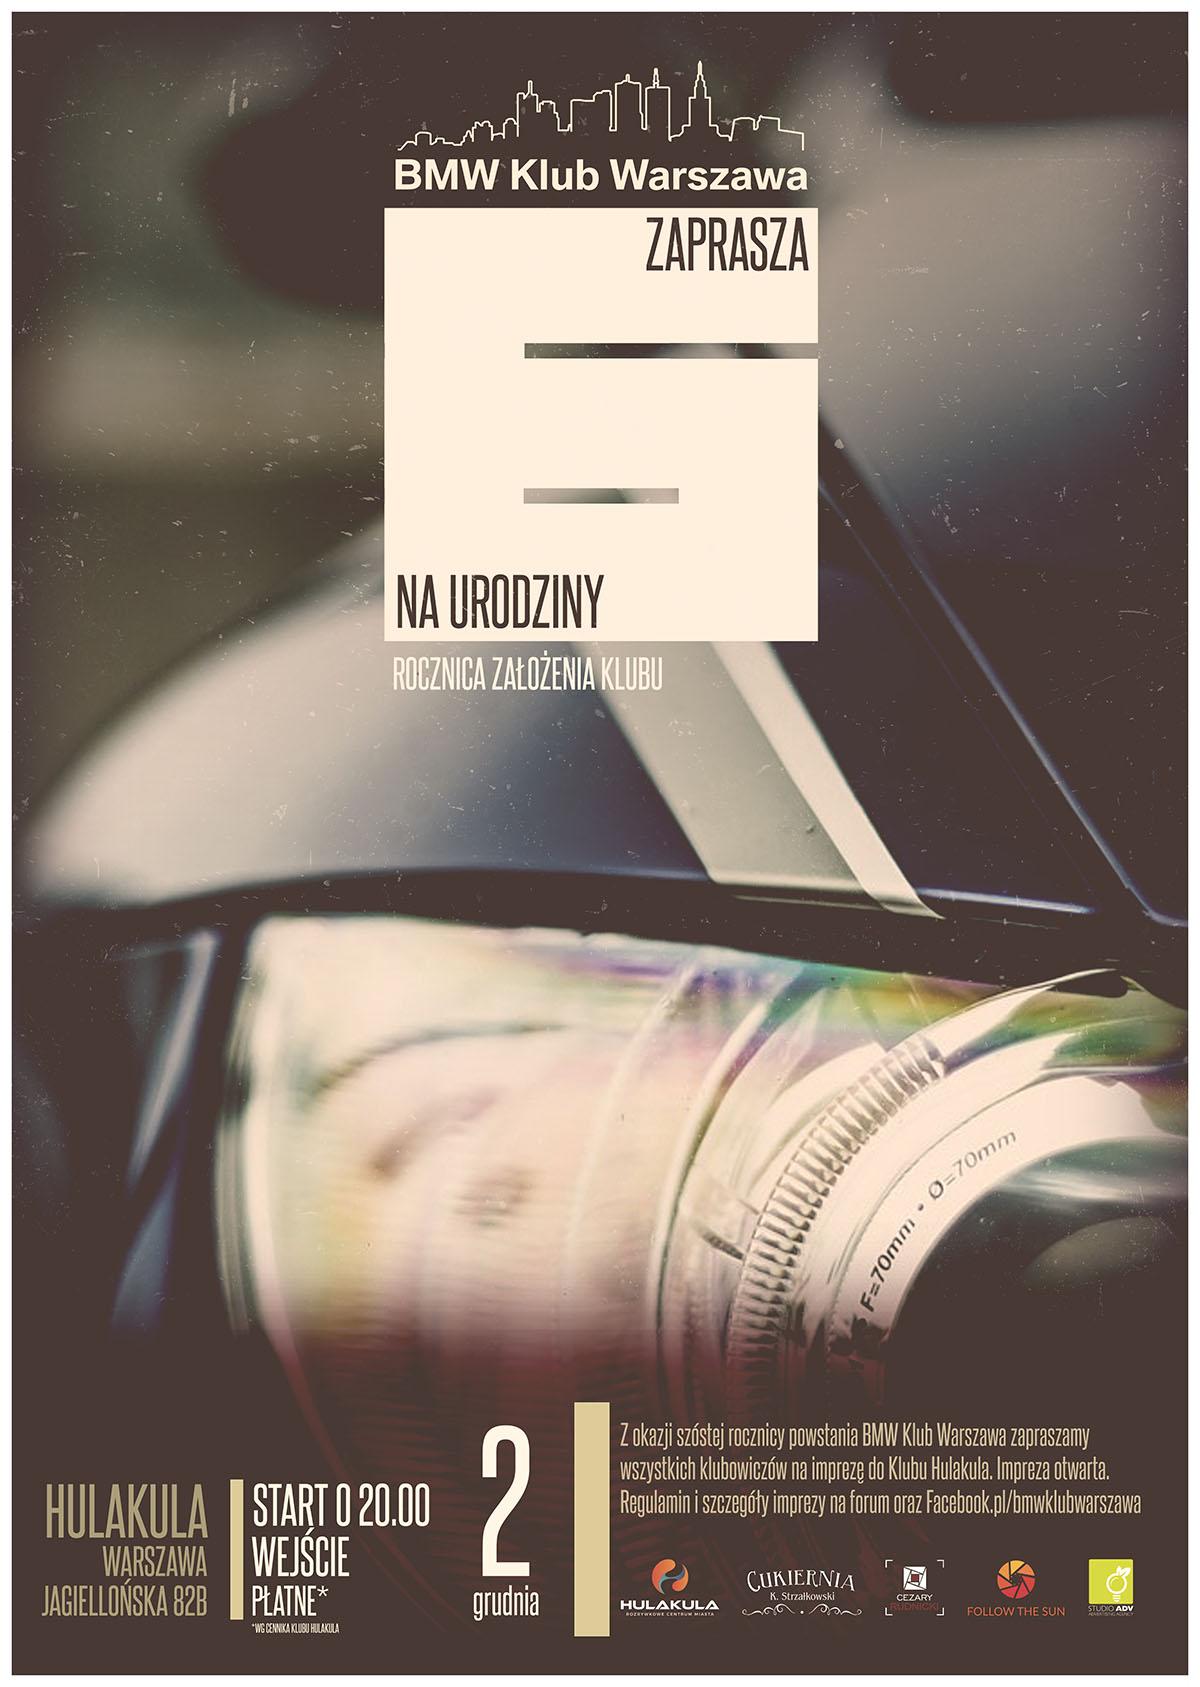 Studio ADV - BKW anniversary poster